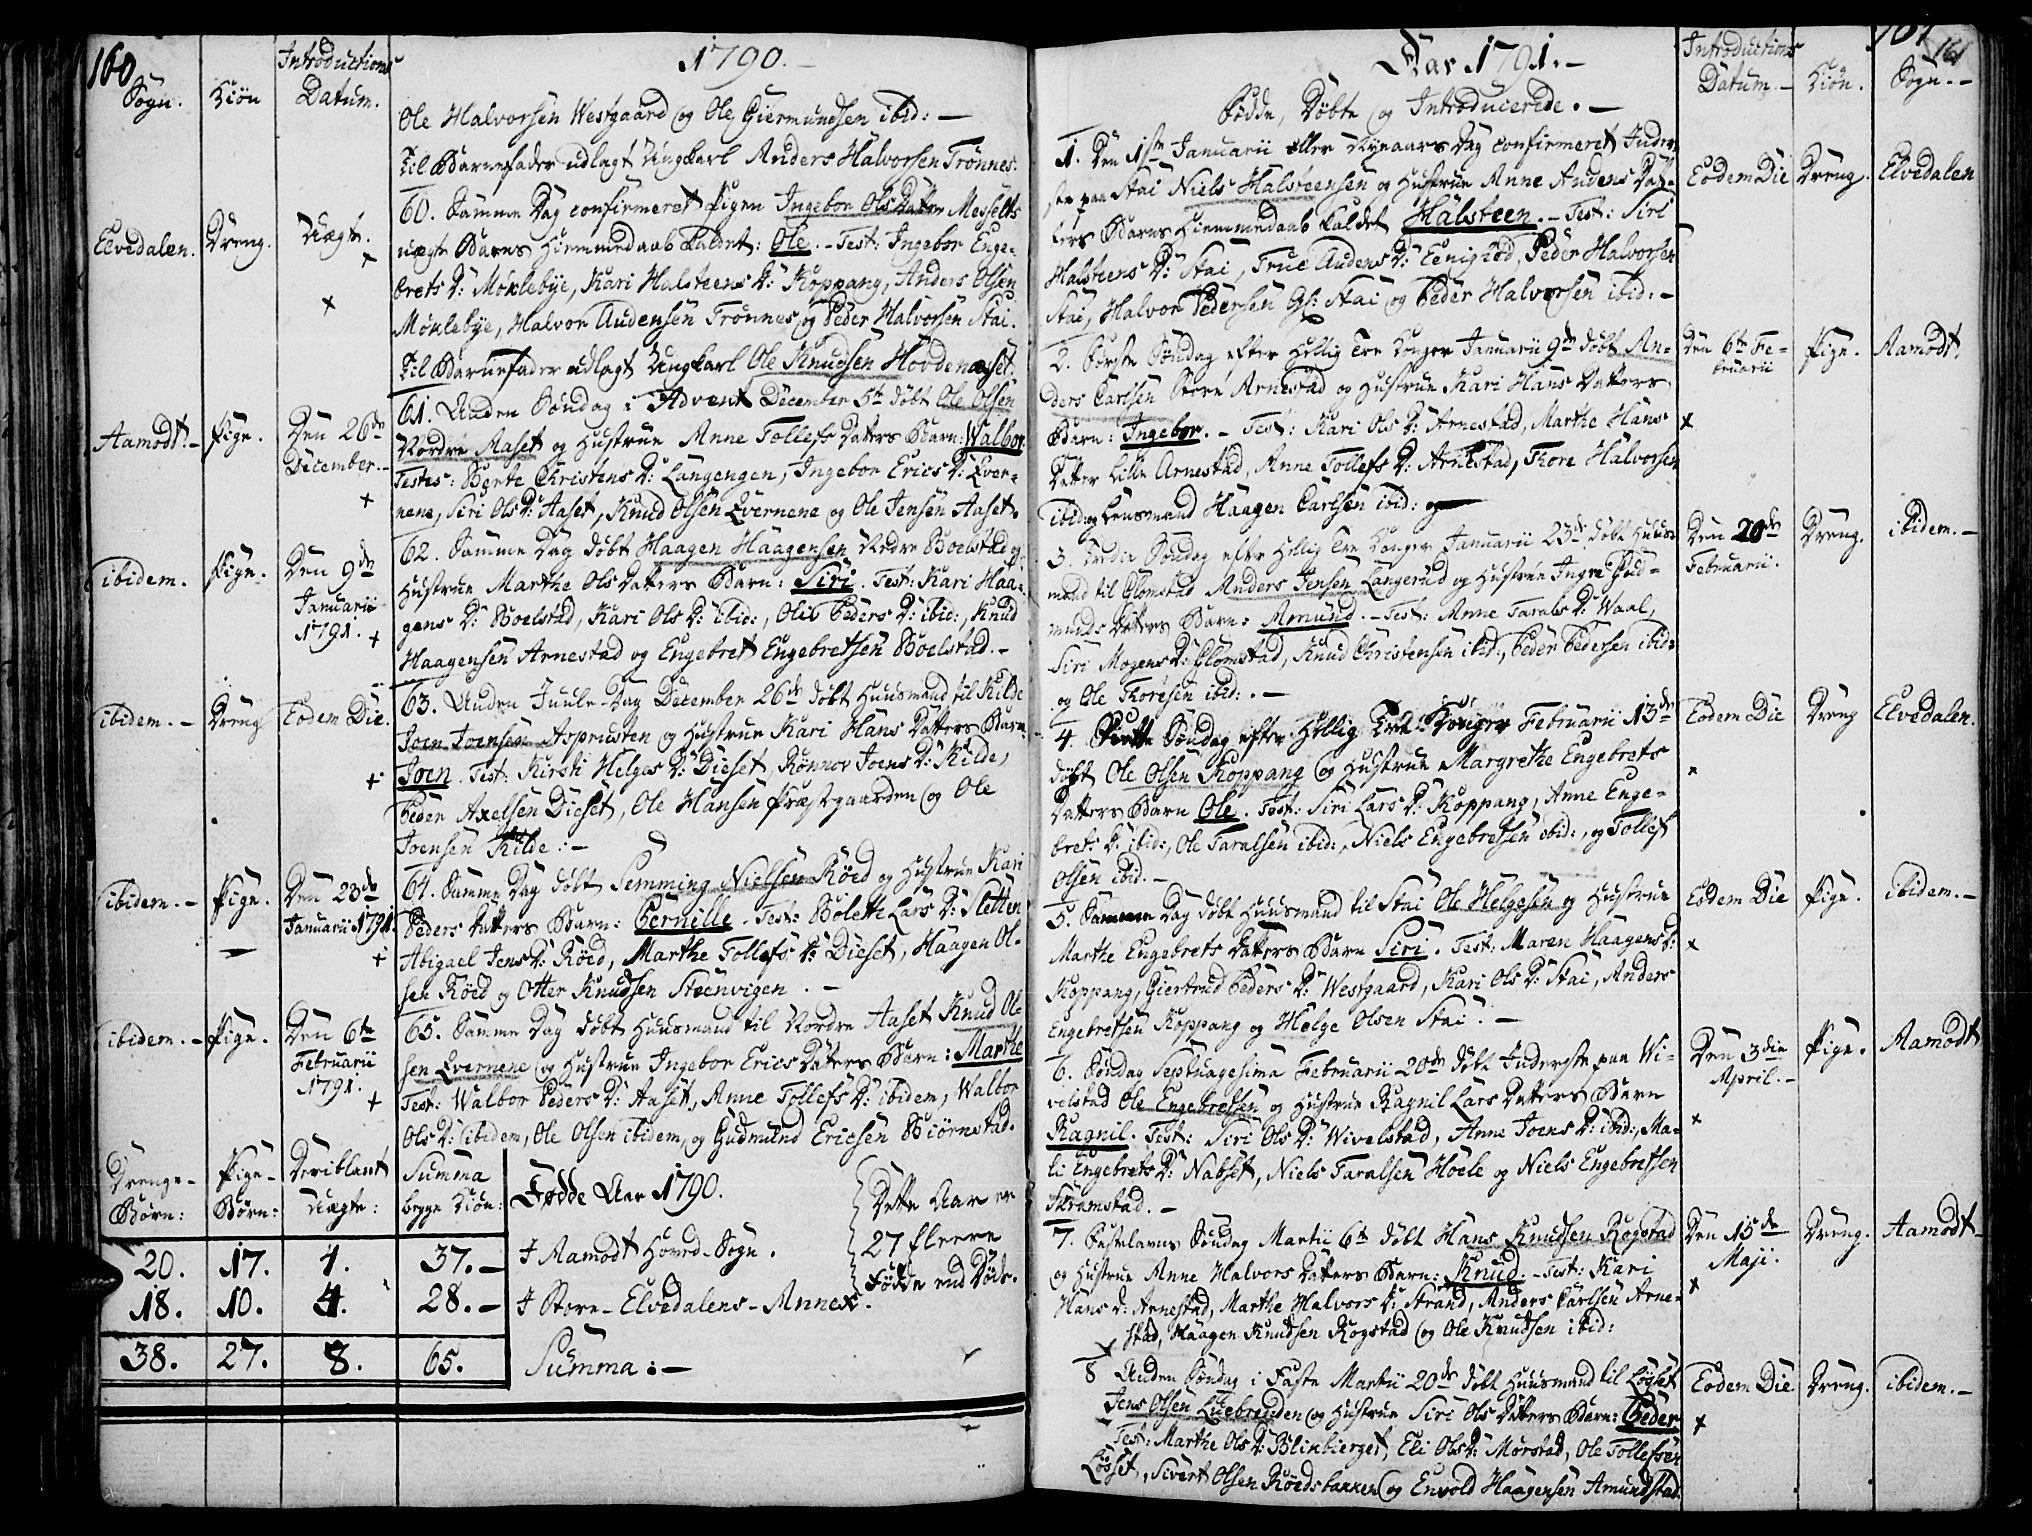 SAH, Åmot prestekontor, Ministerialbok nr. 3, 1780-1810, s. 160-161